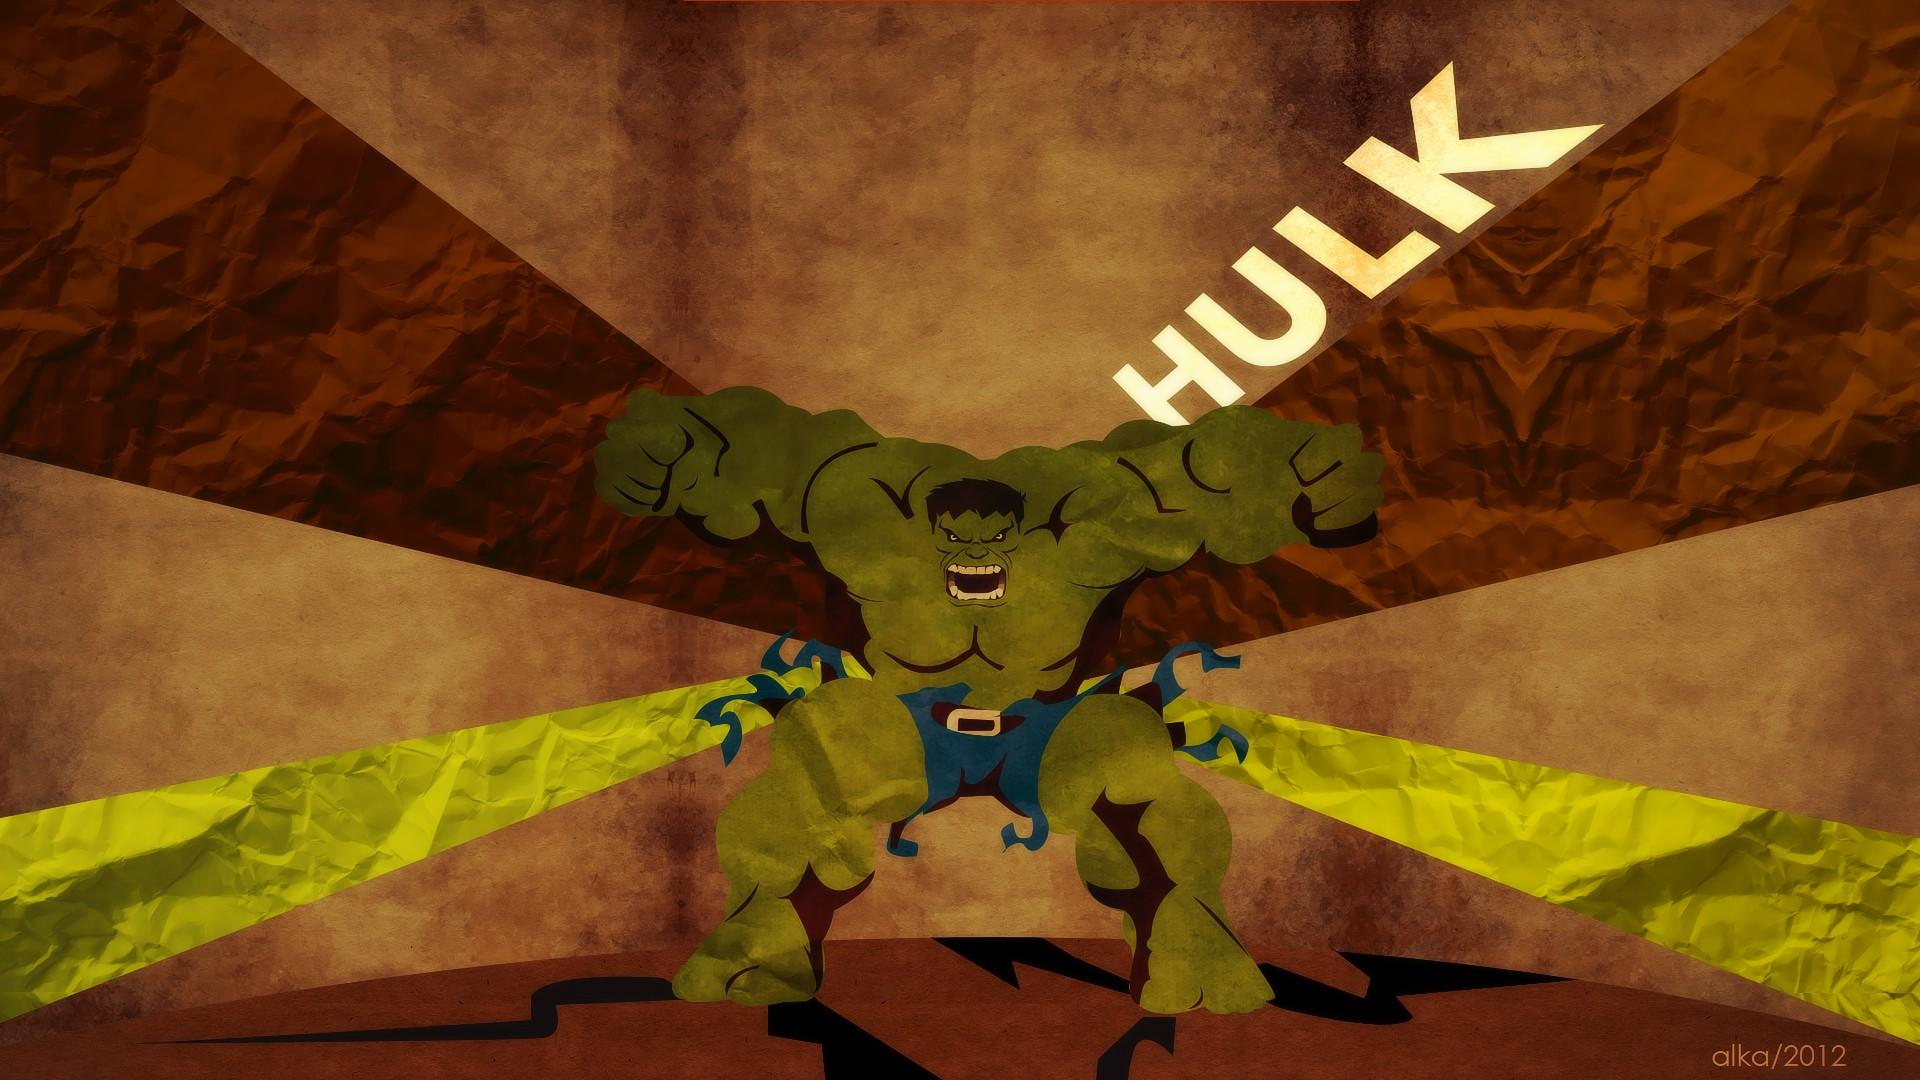 Hulk hd wallpaper background image 1920x1080 id - Marvel retro wallpaper ...